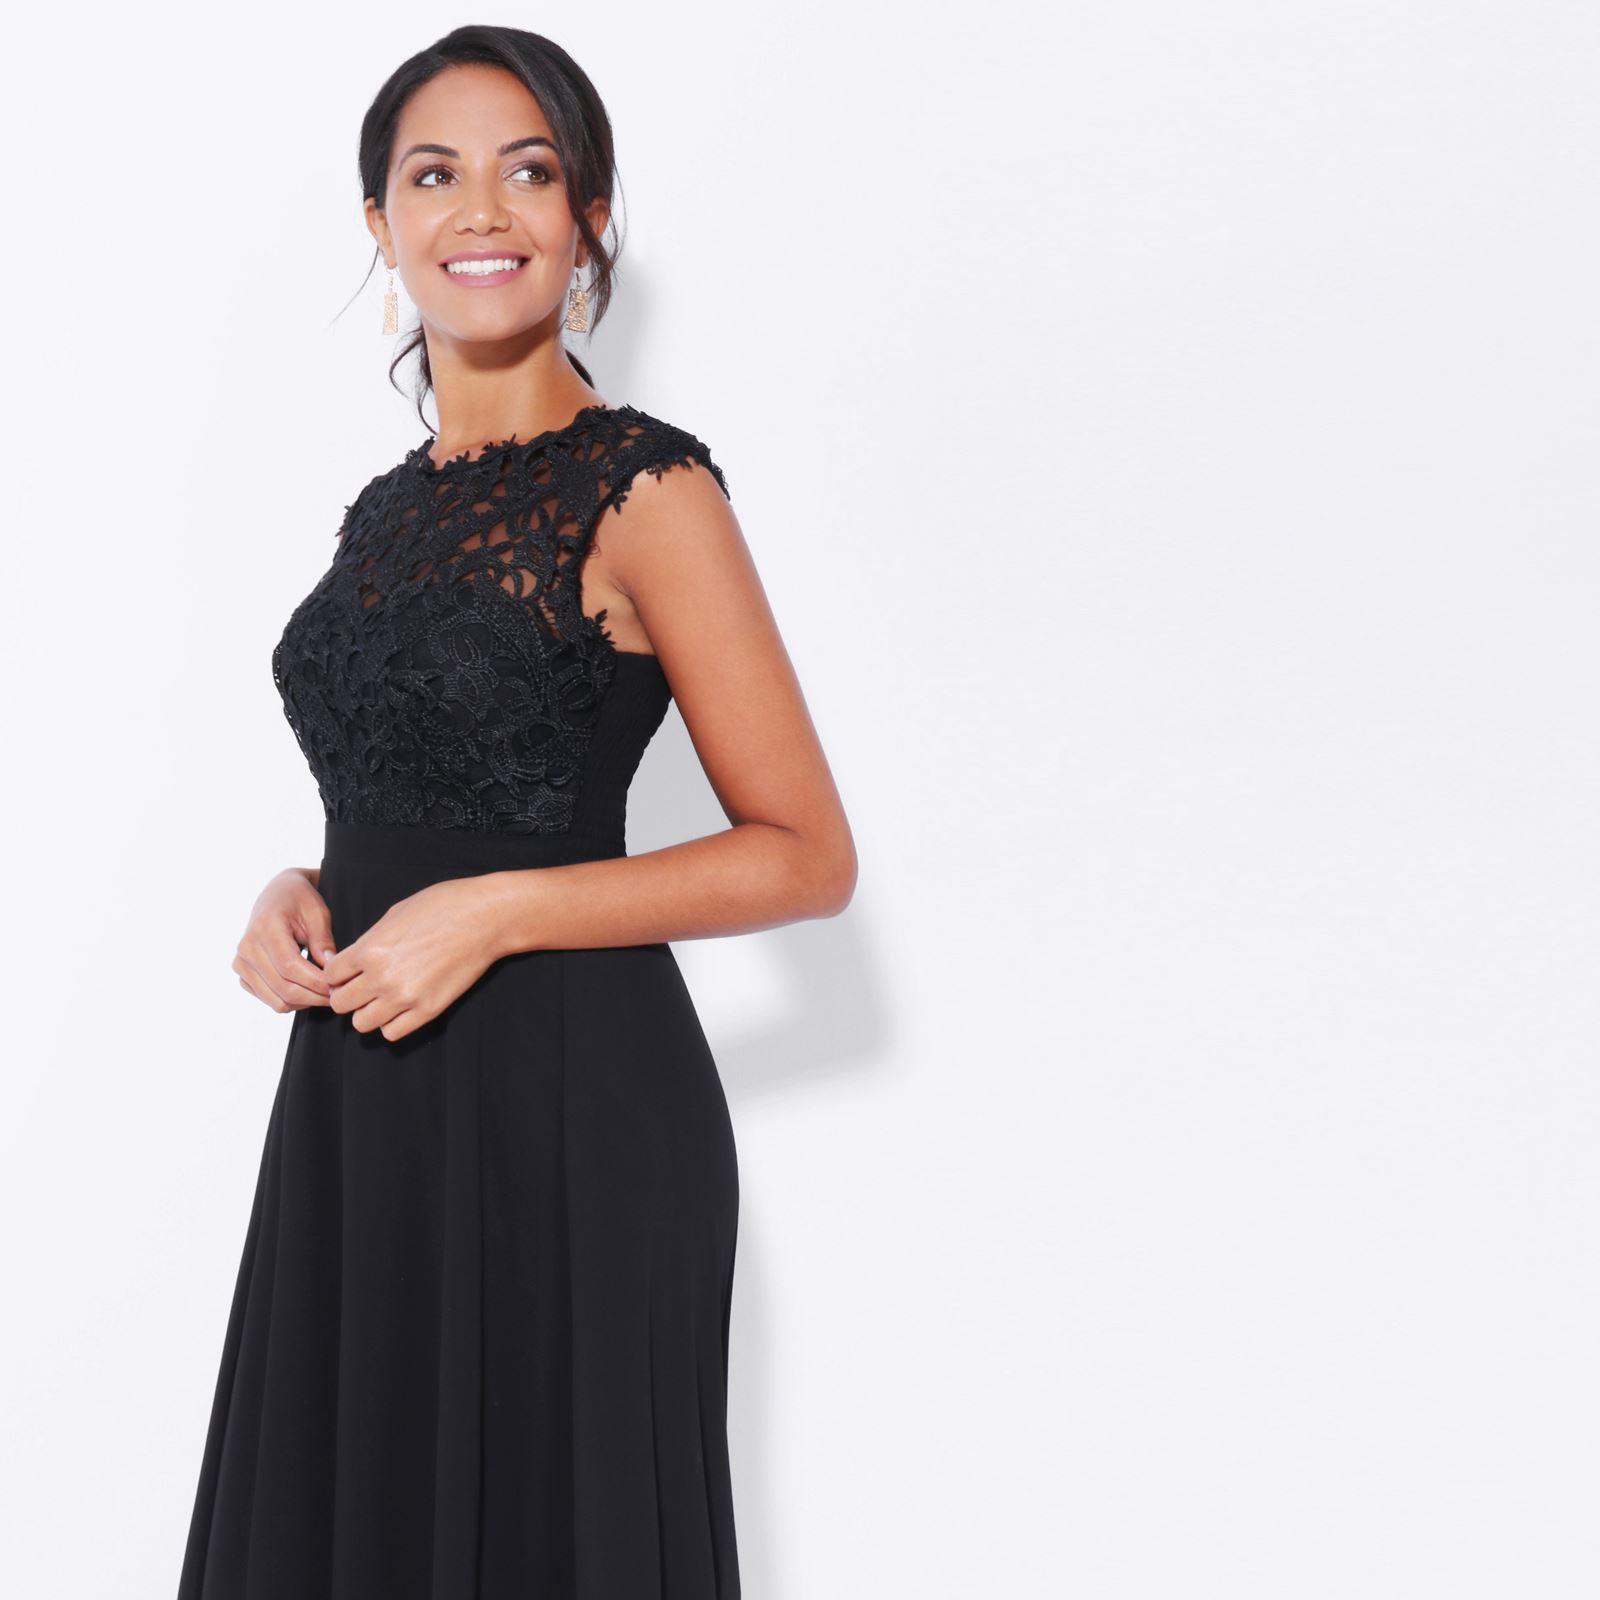 Womens-Wedding-Bridesmaid-Prom-Dress-Formal-One-Off-Shoulder-Long-Evening-8-18 thumbnail 12